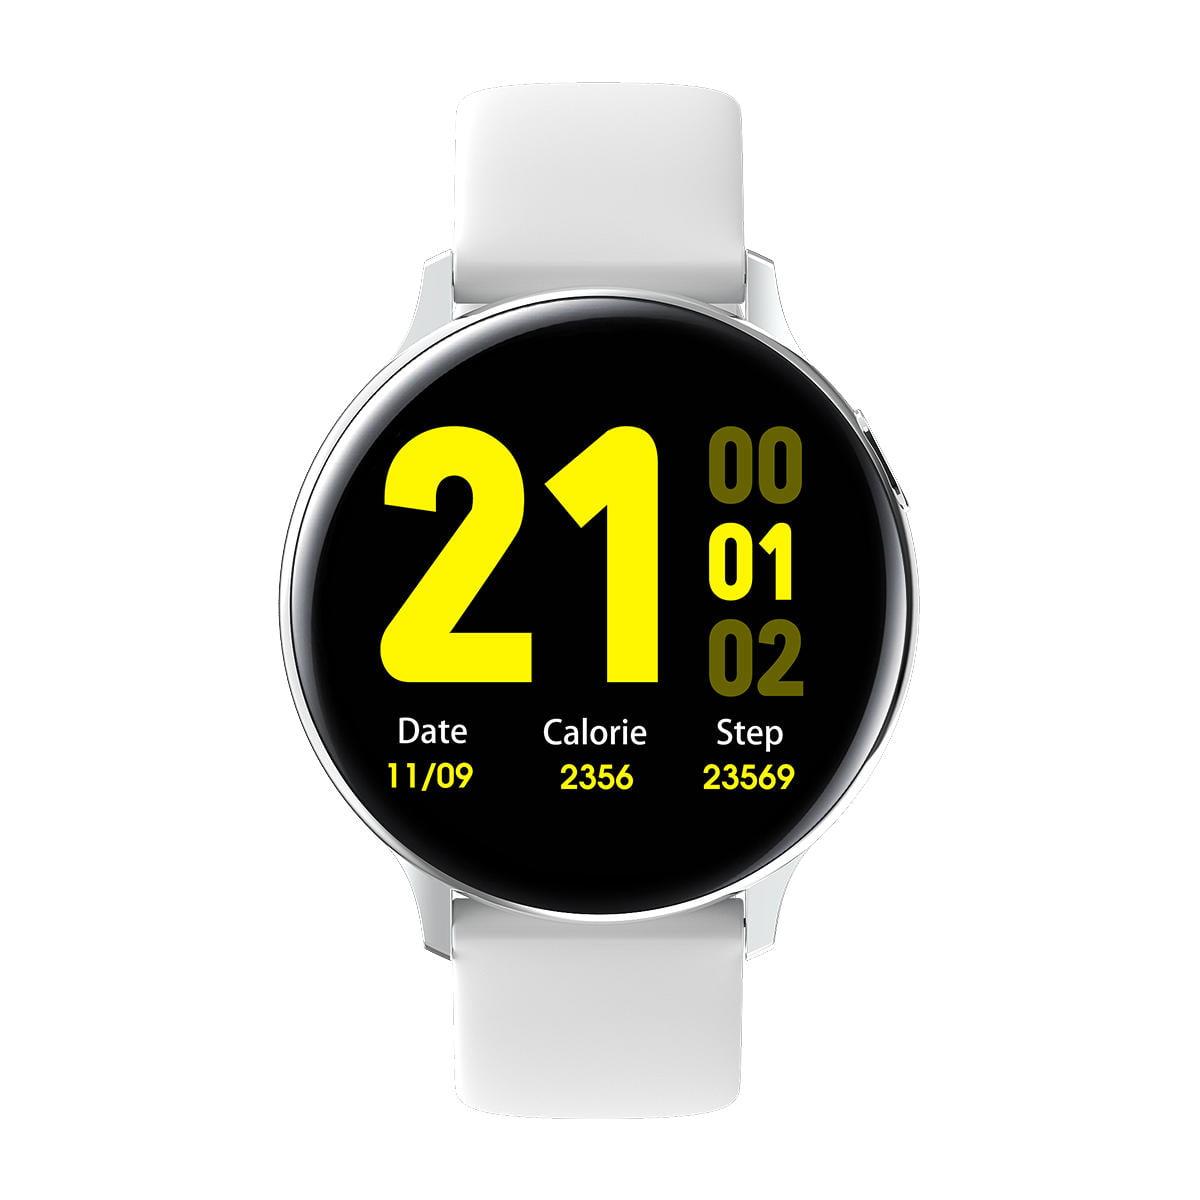 Bakeey smartwatch S20 ECG monitor smart watch heart rate monitor blood pressure (20)